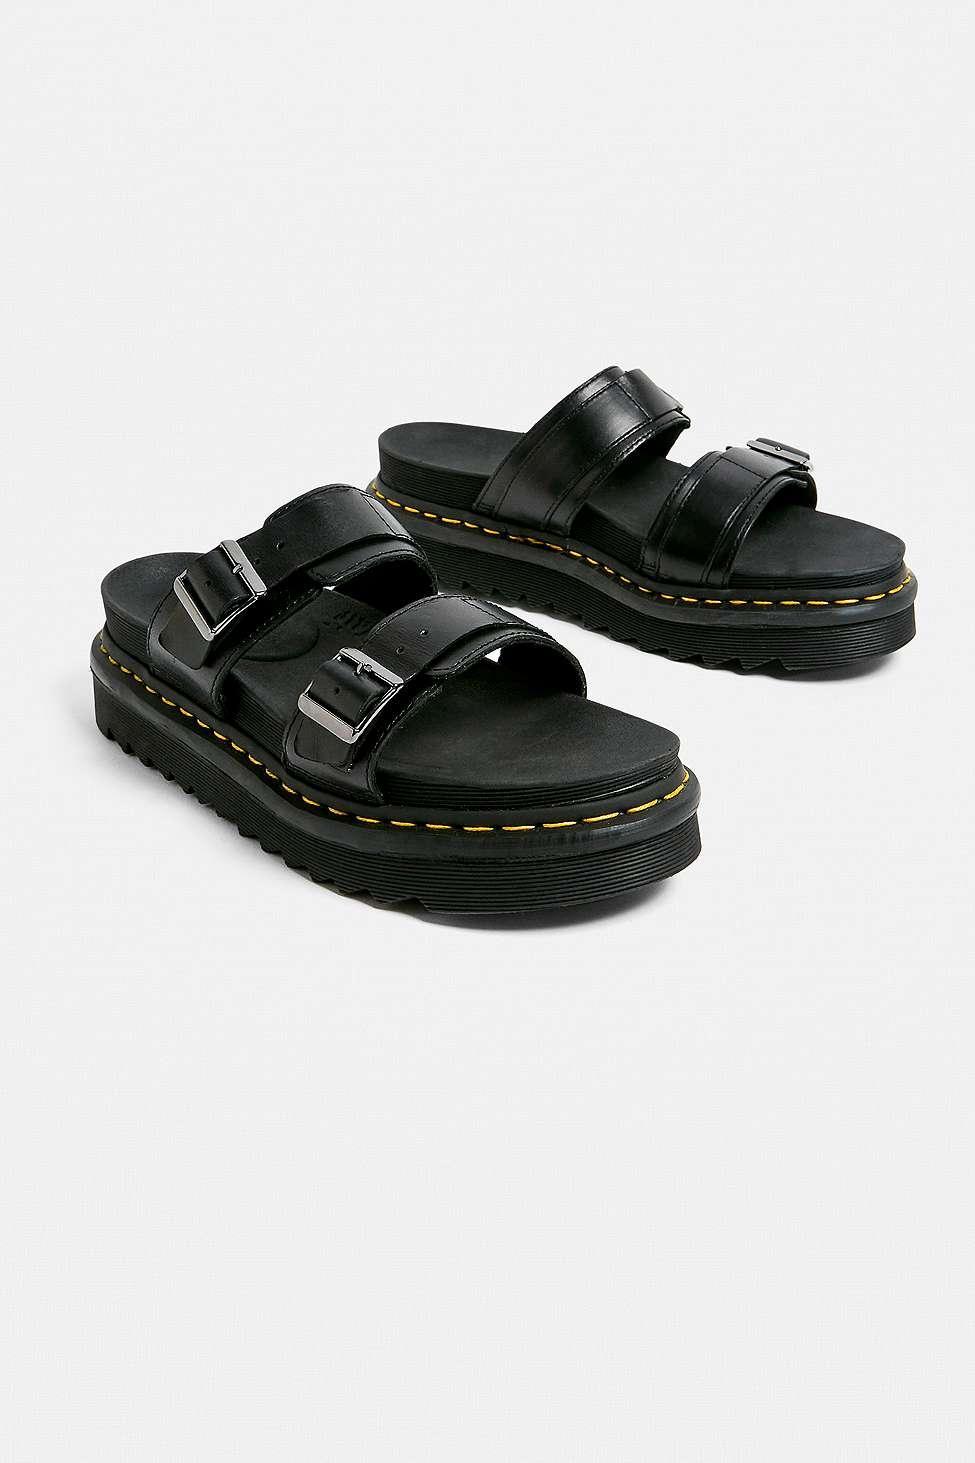 cf29aa3c2 Dr. Martens Myles Brando Black Sandals in Black for Men - Lyst